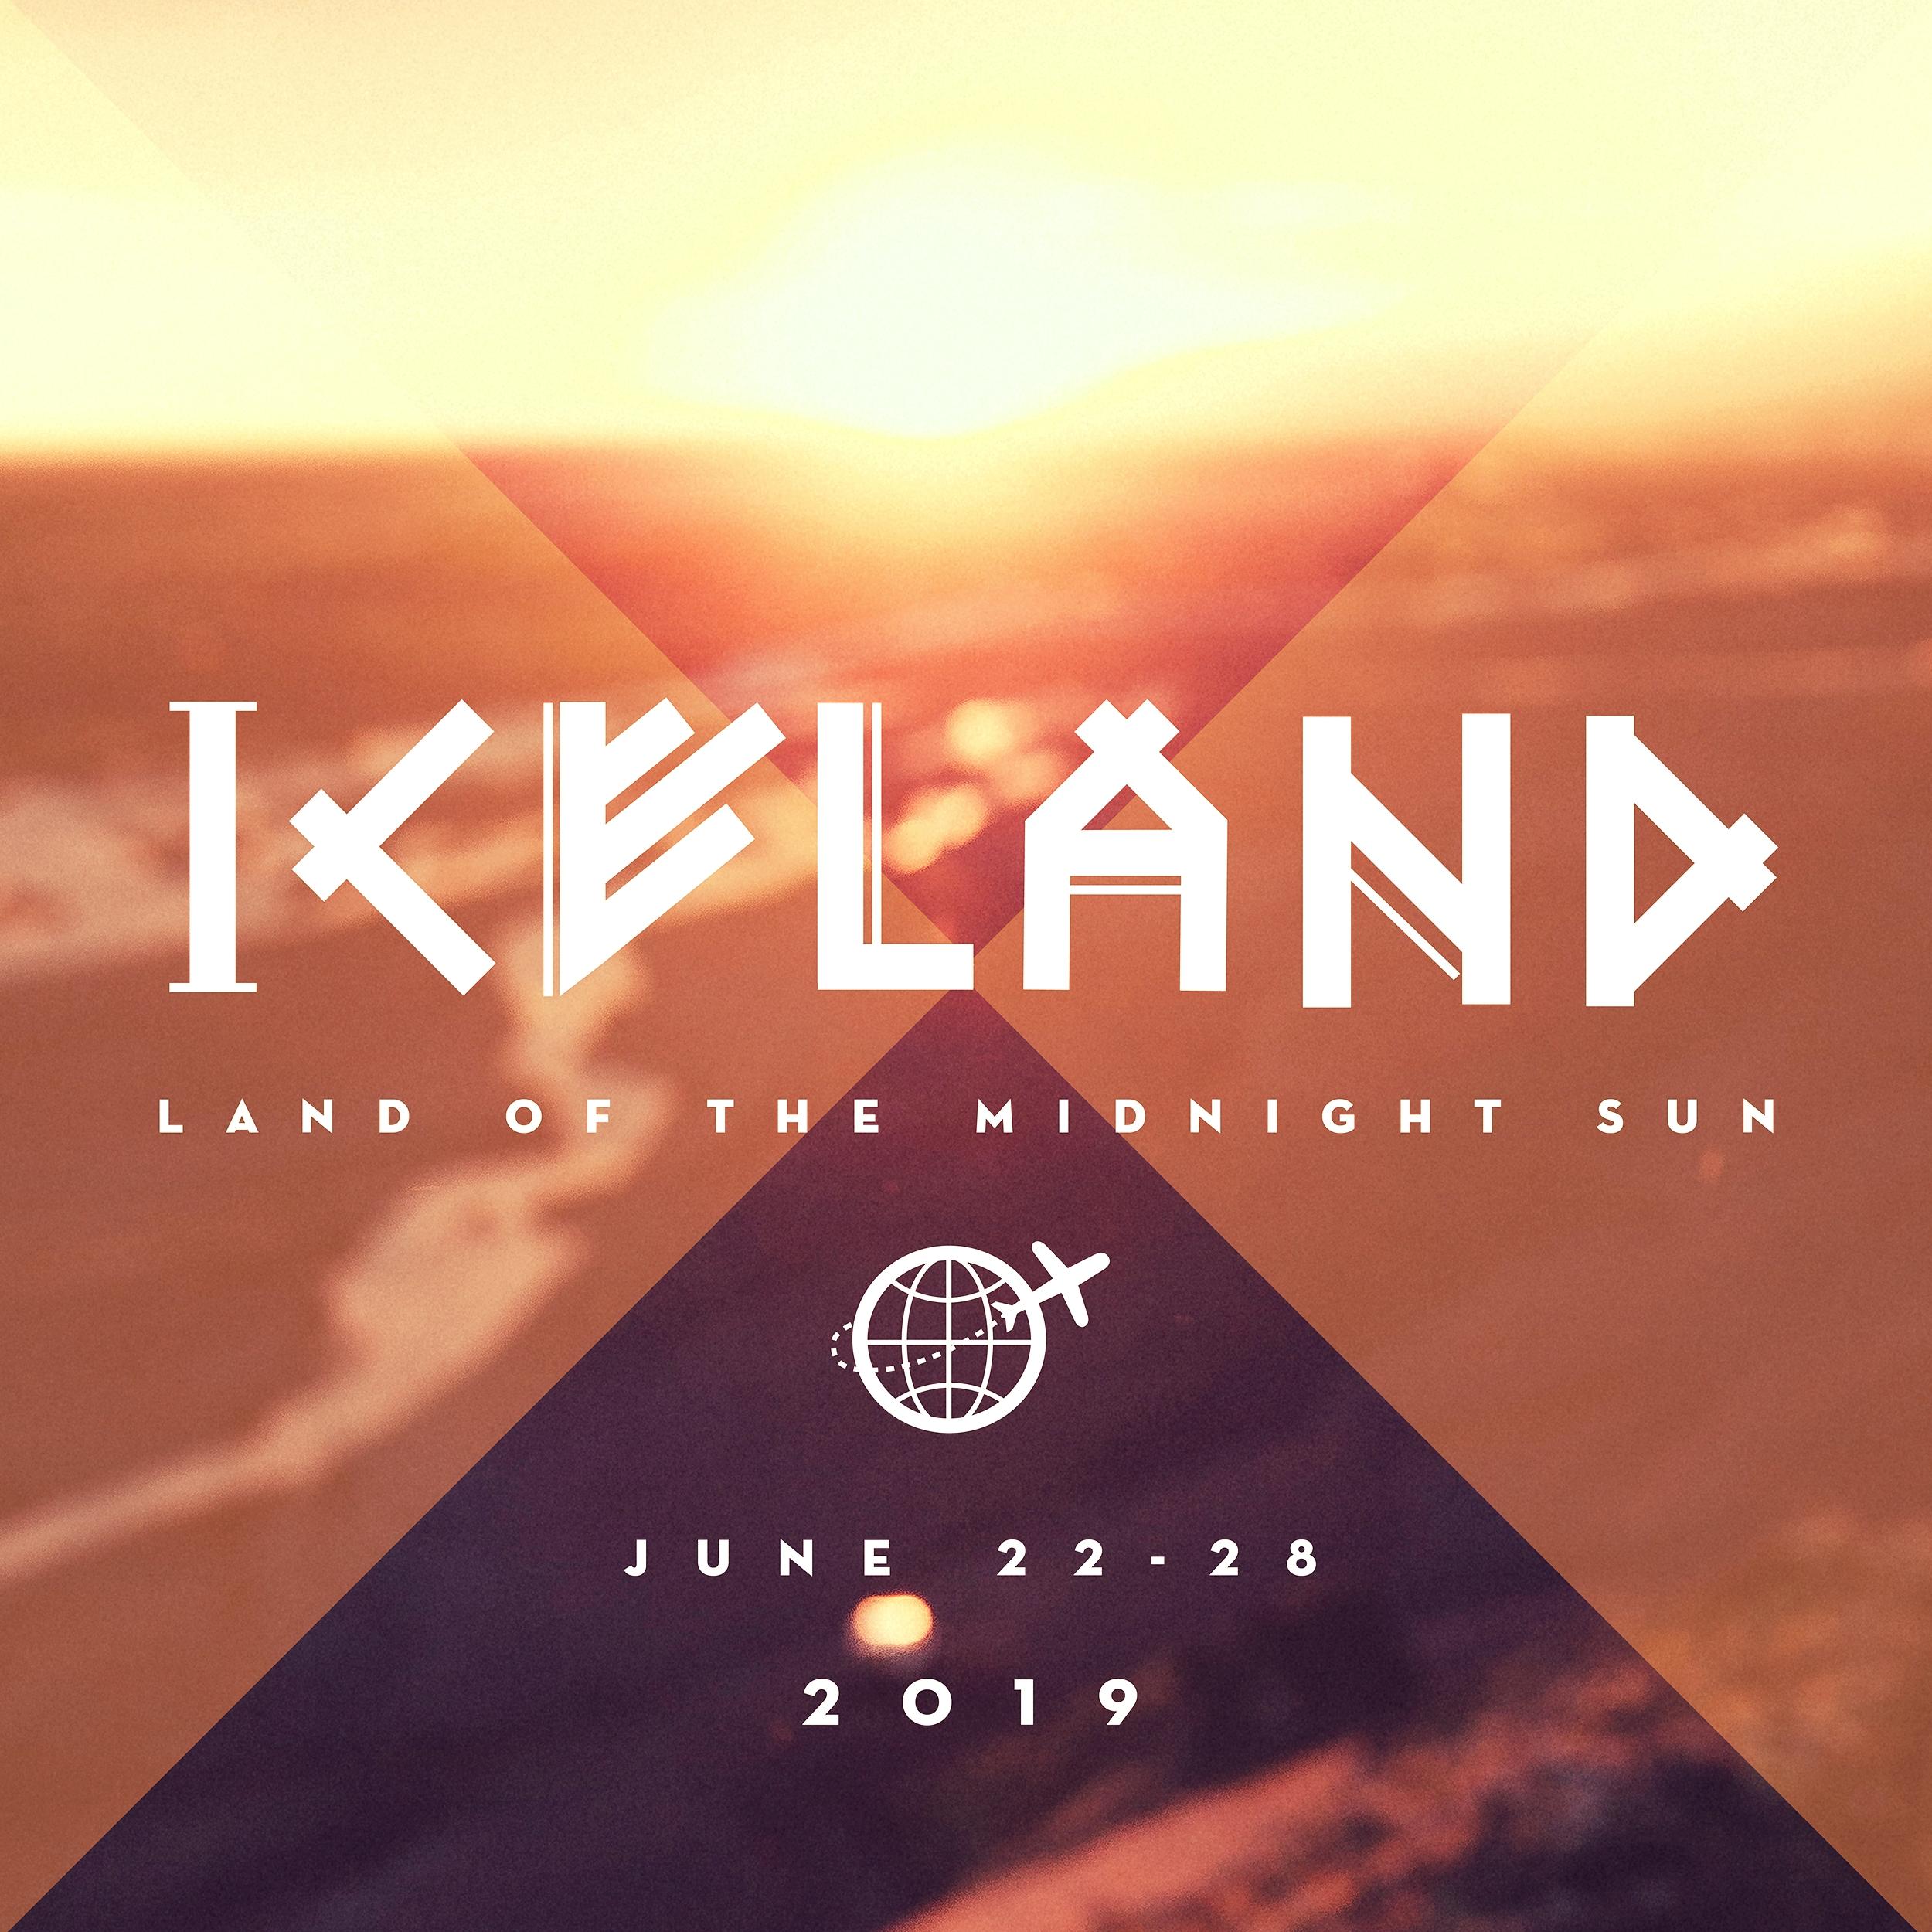 ICELAND JUNE 2019: LAND OF THE MIDNIGHT SUN — WHOA travel